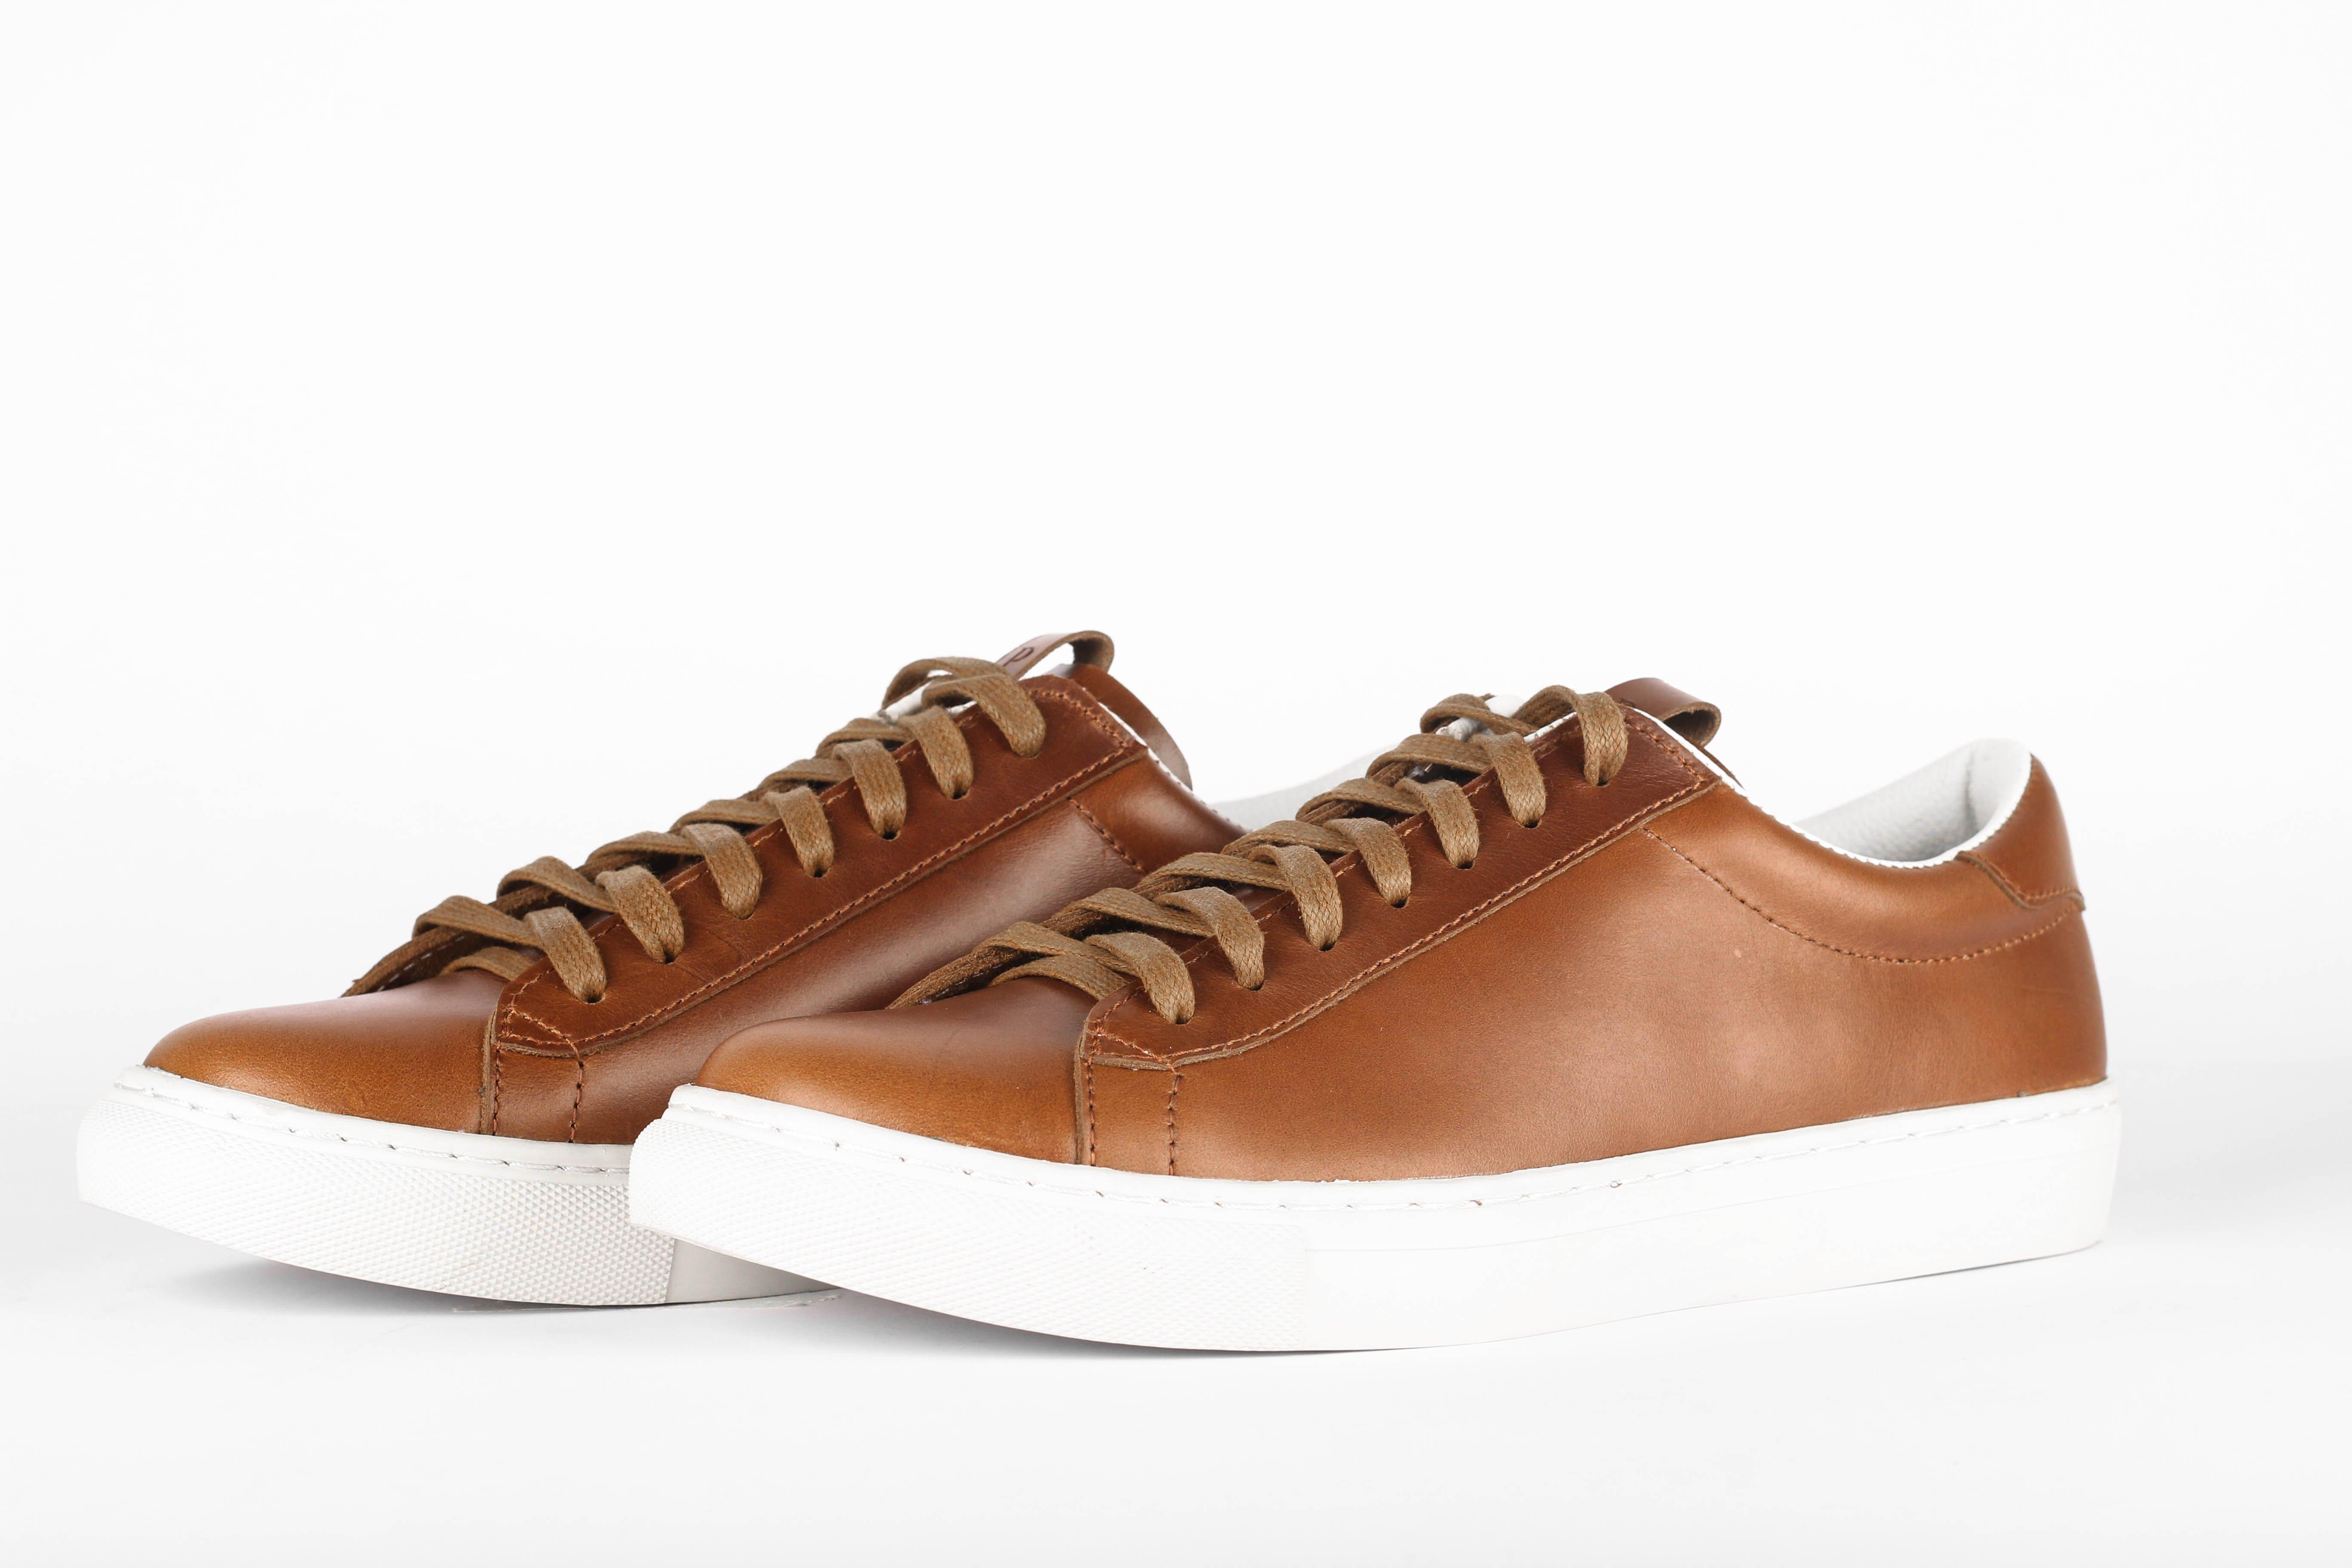 detailed look 4ac56 d2f5b Details zu Paradigm Shoes Herren Berlin Sneaker Italienisch Handgefertigte  Turnschuhe Amber